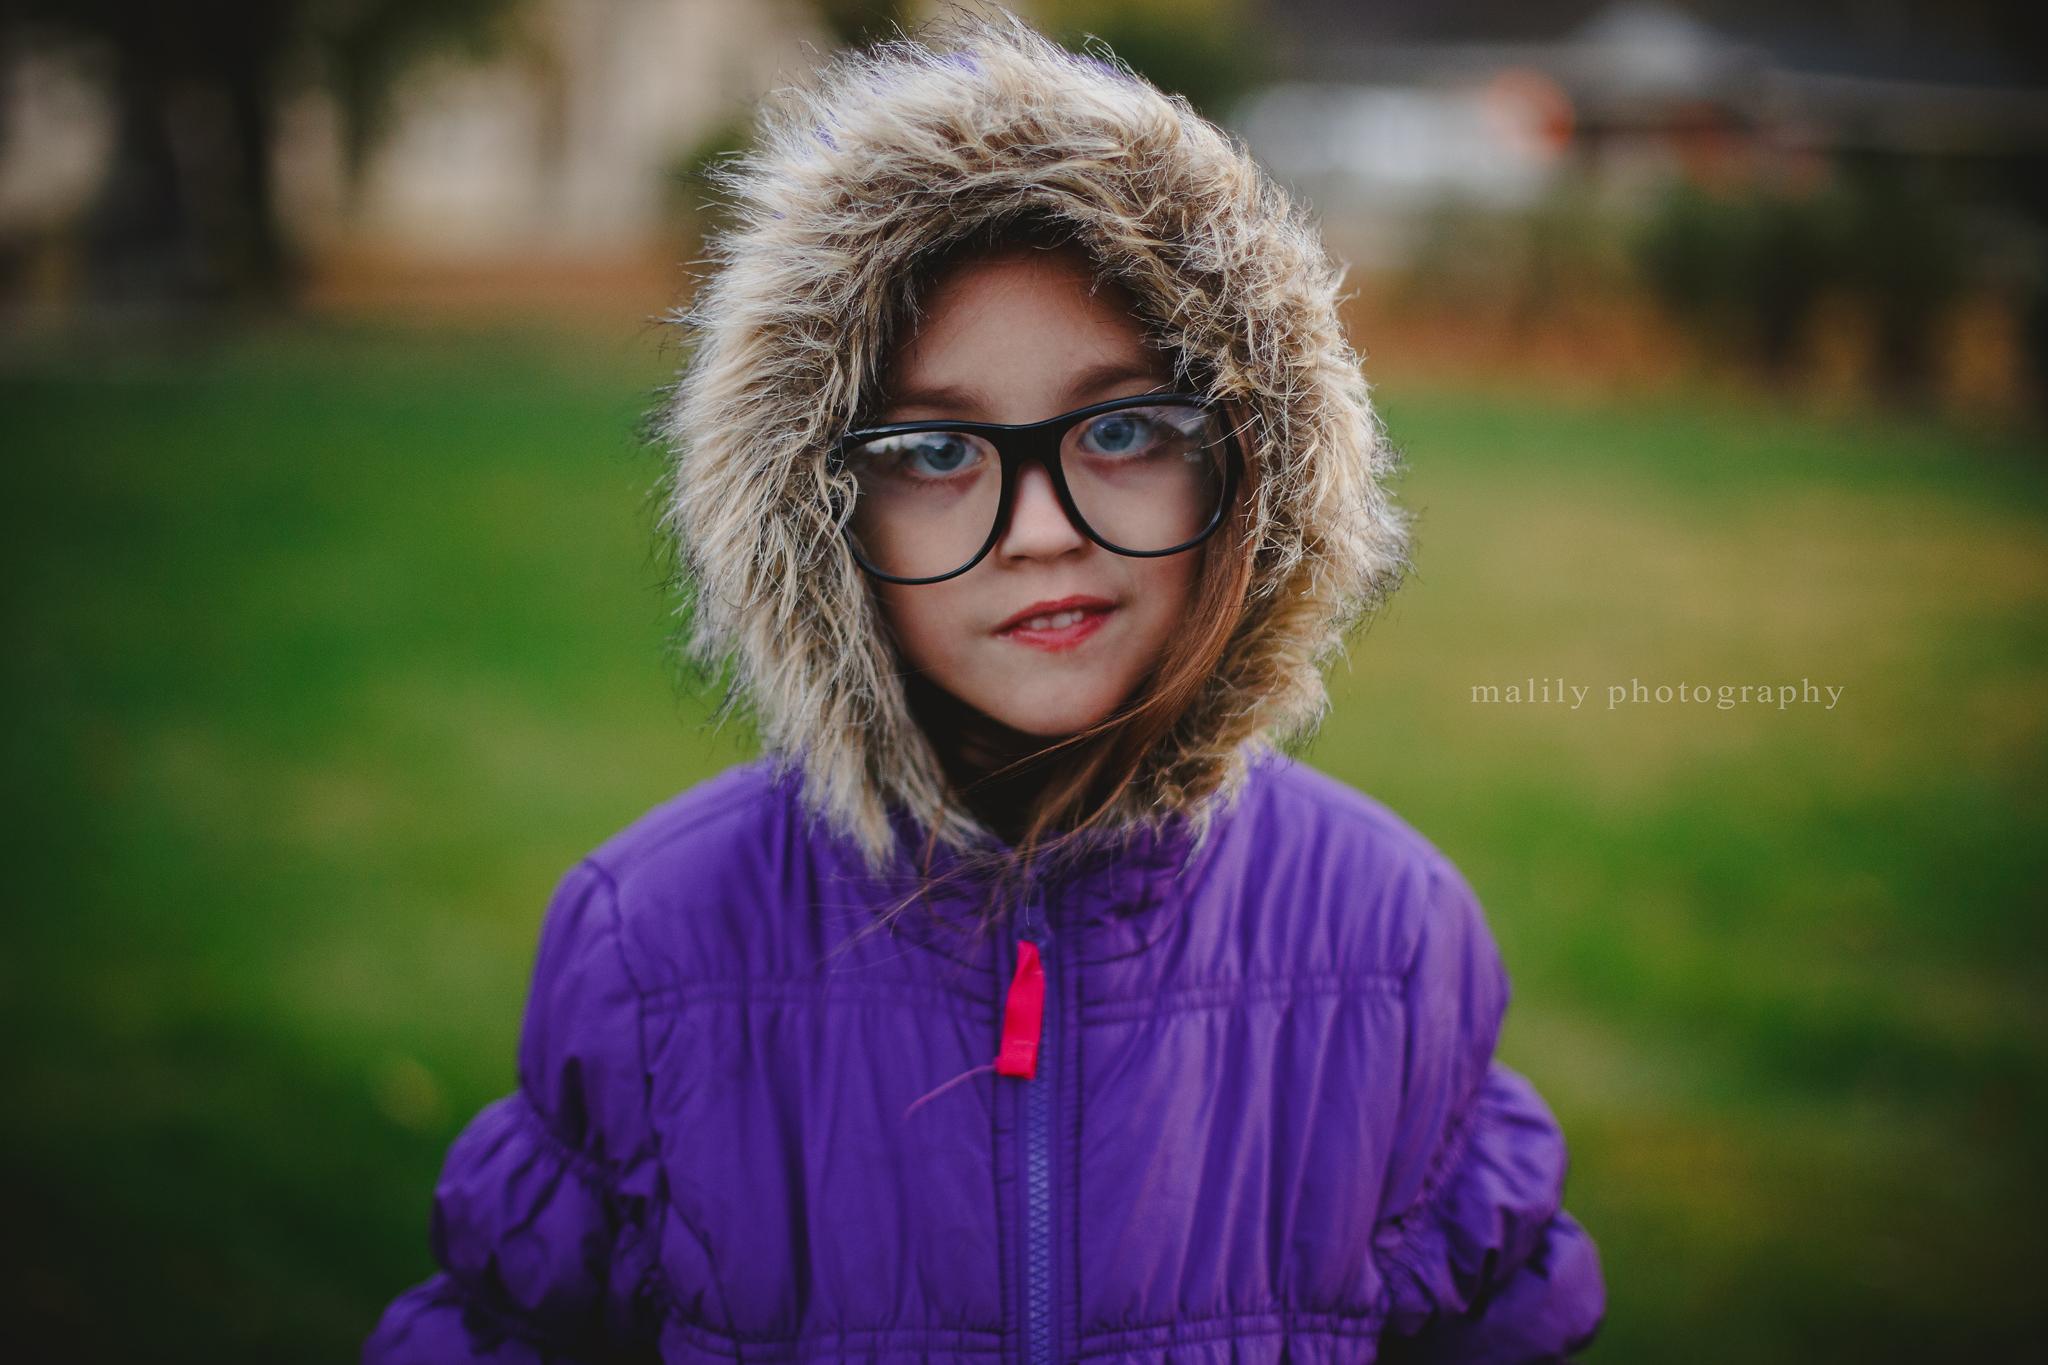 malilyphotography glasses.jpg